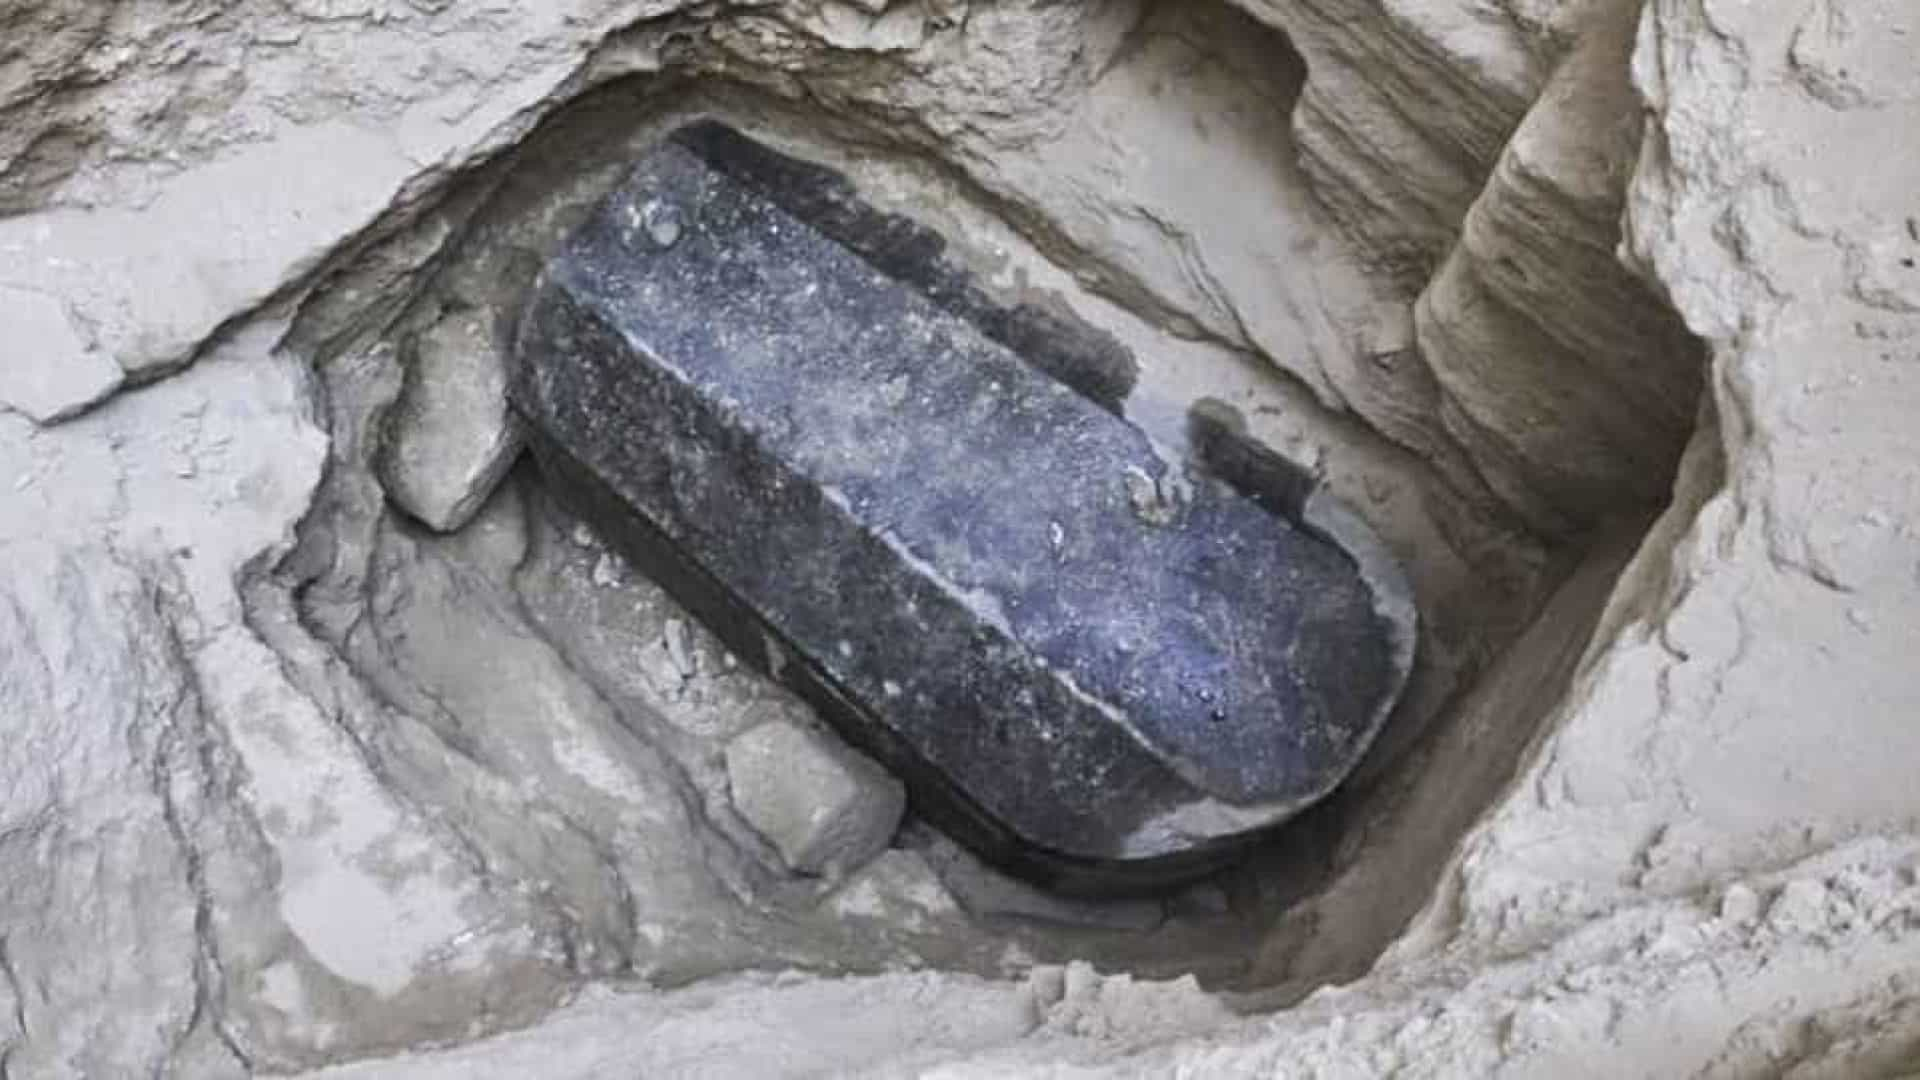 Desafiando alerta da web, arqueólogos abrem sarcófago negro no Egito